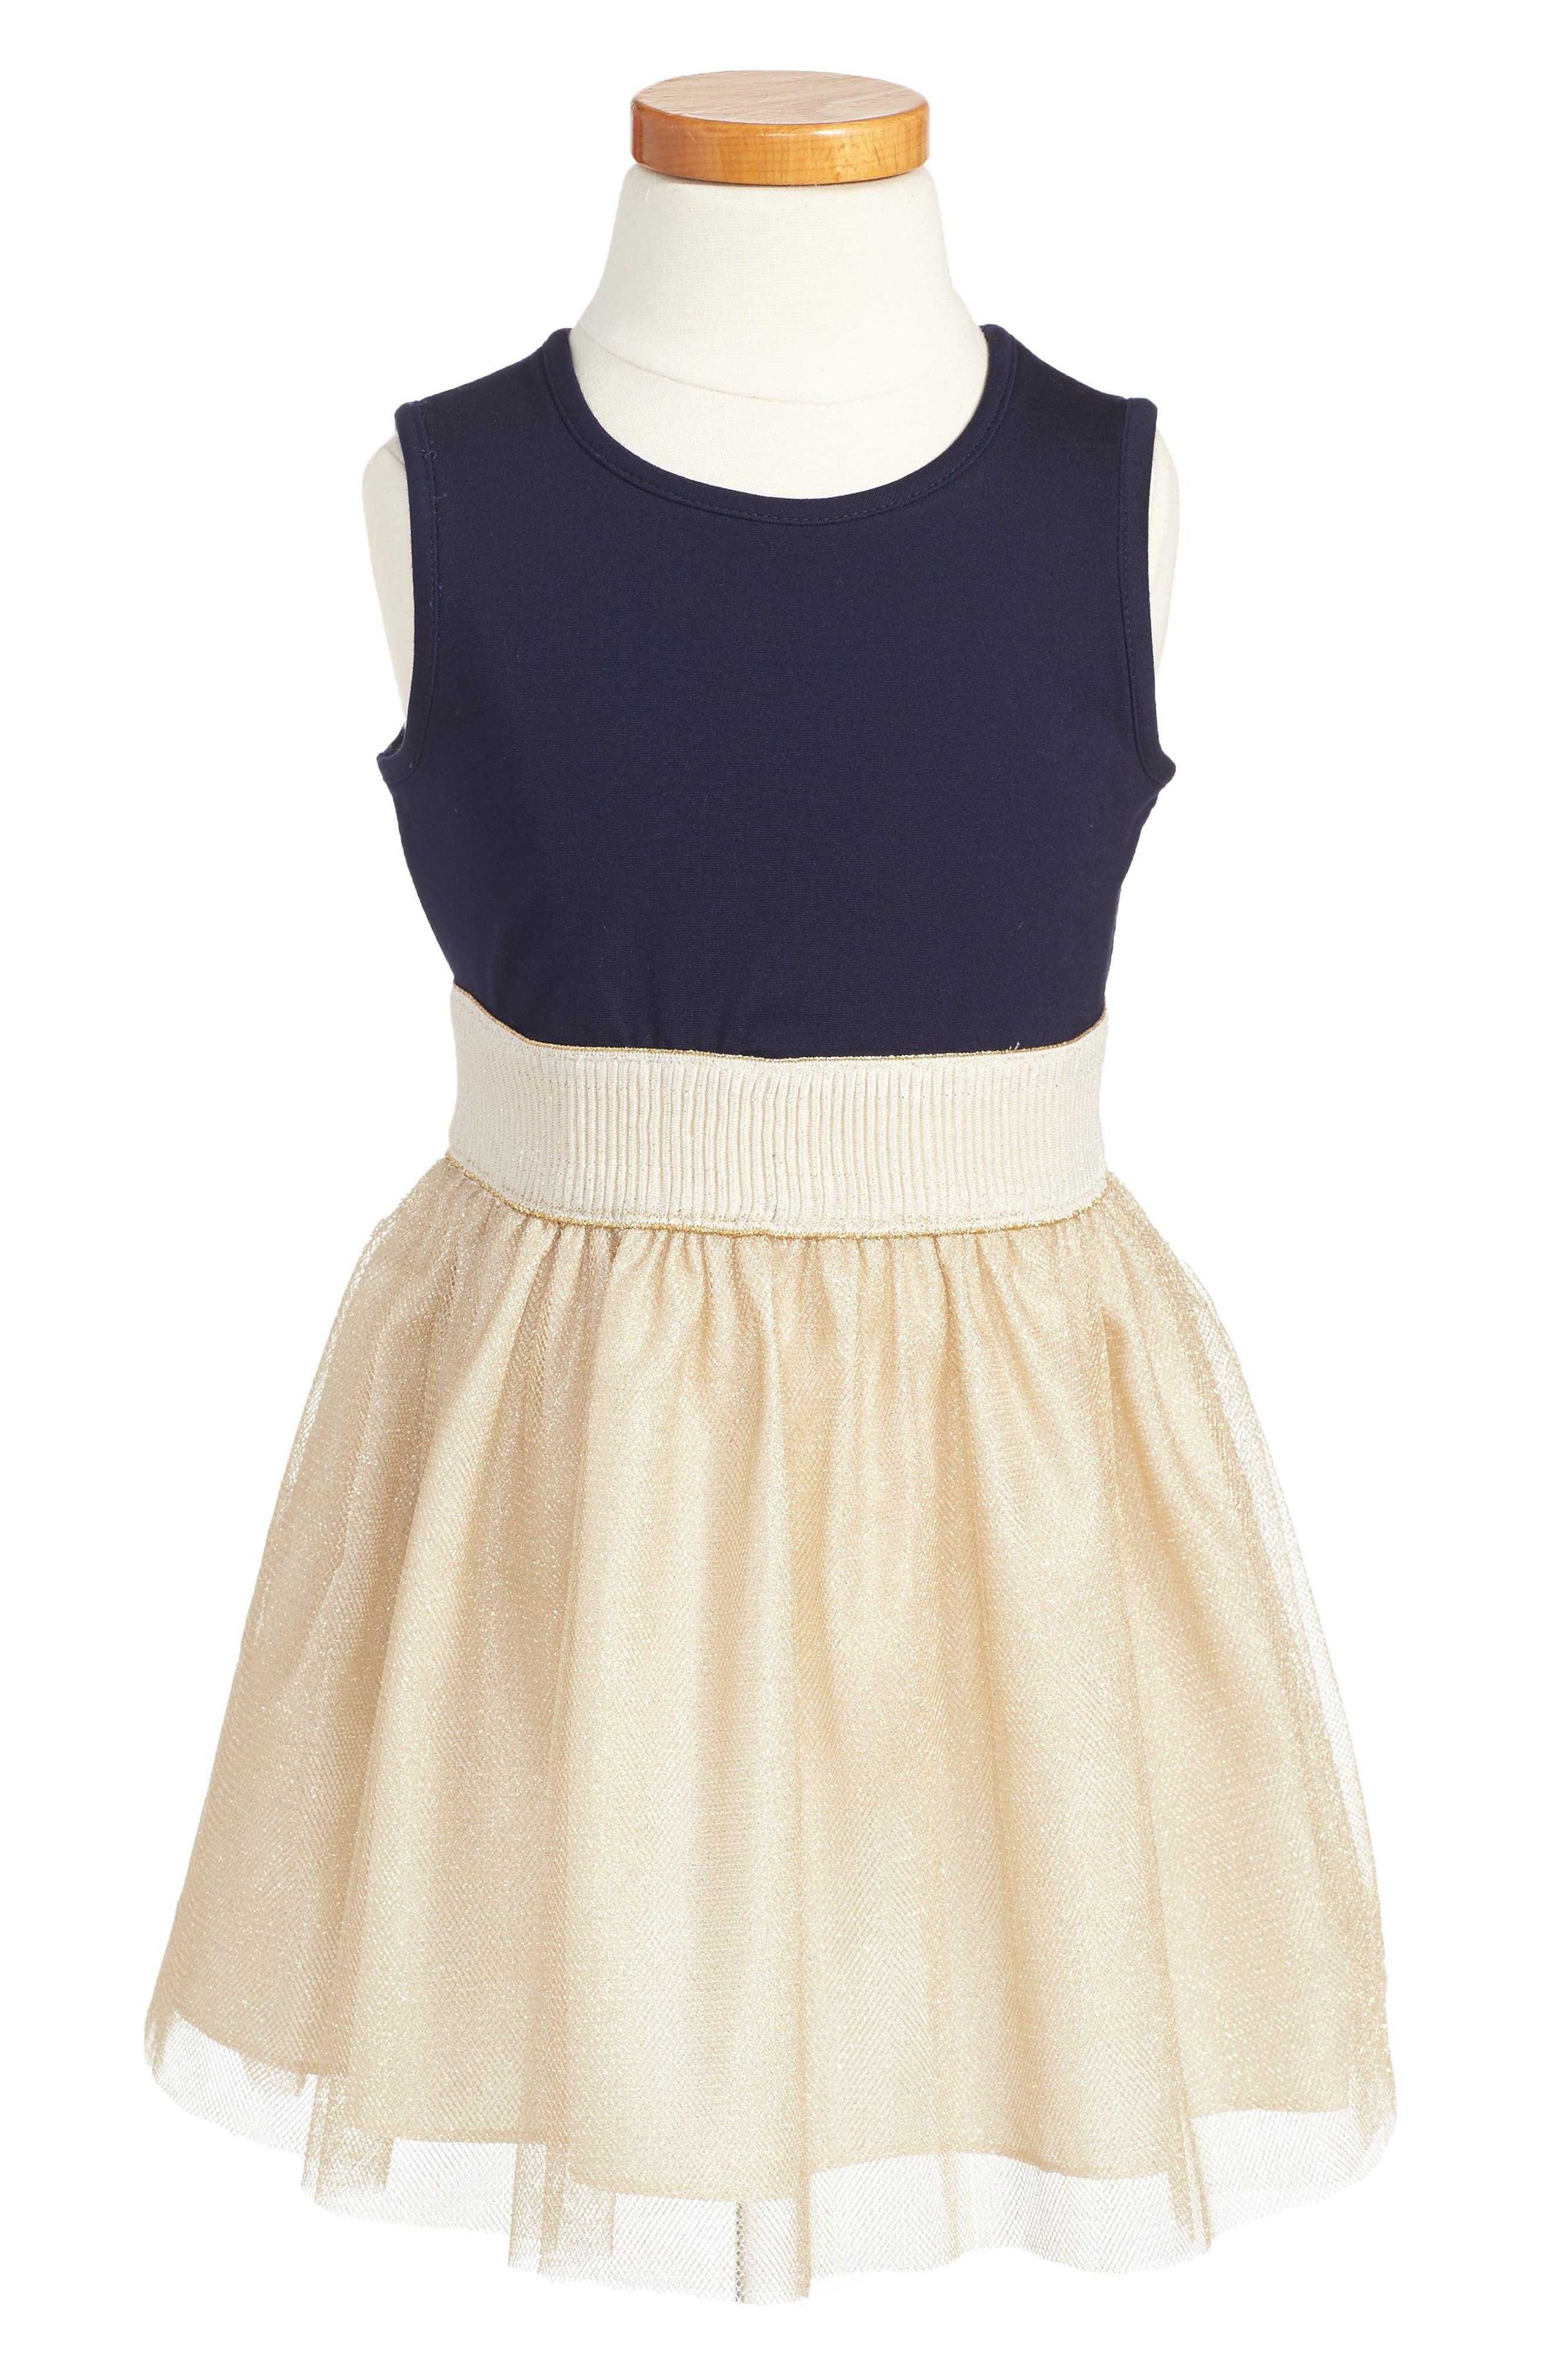 Majorette Jacket & Tank Dress Set,                             Alternate thumbnail 3, color,                             Navy/ Gold